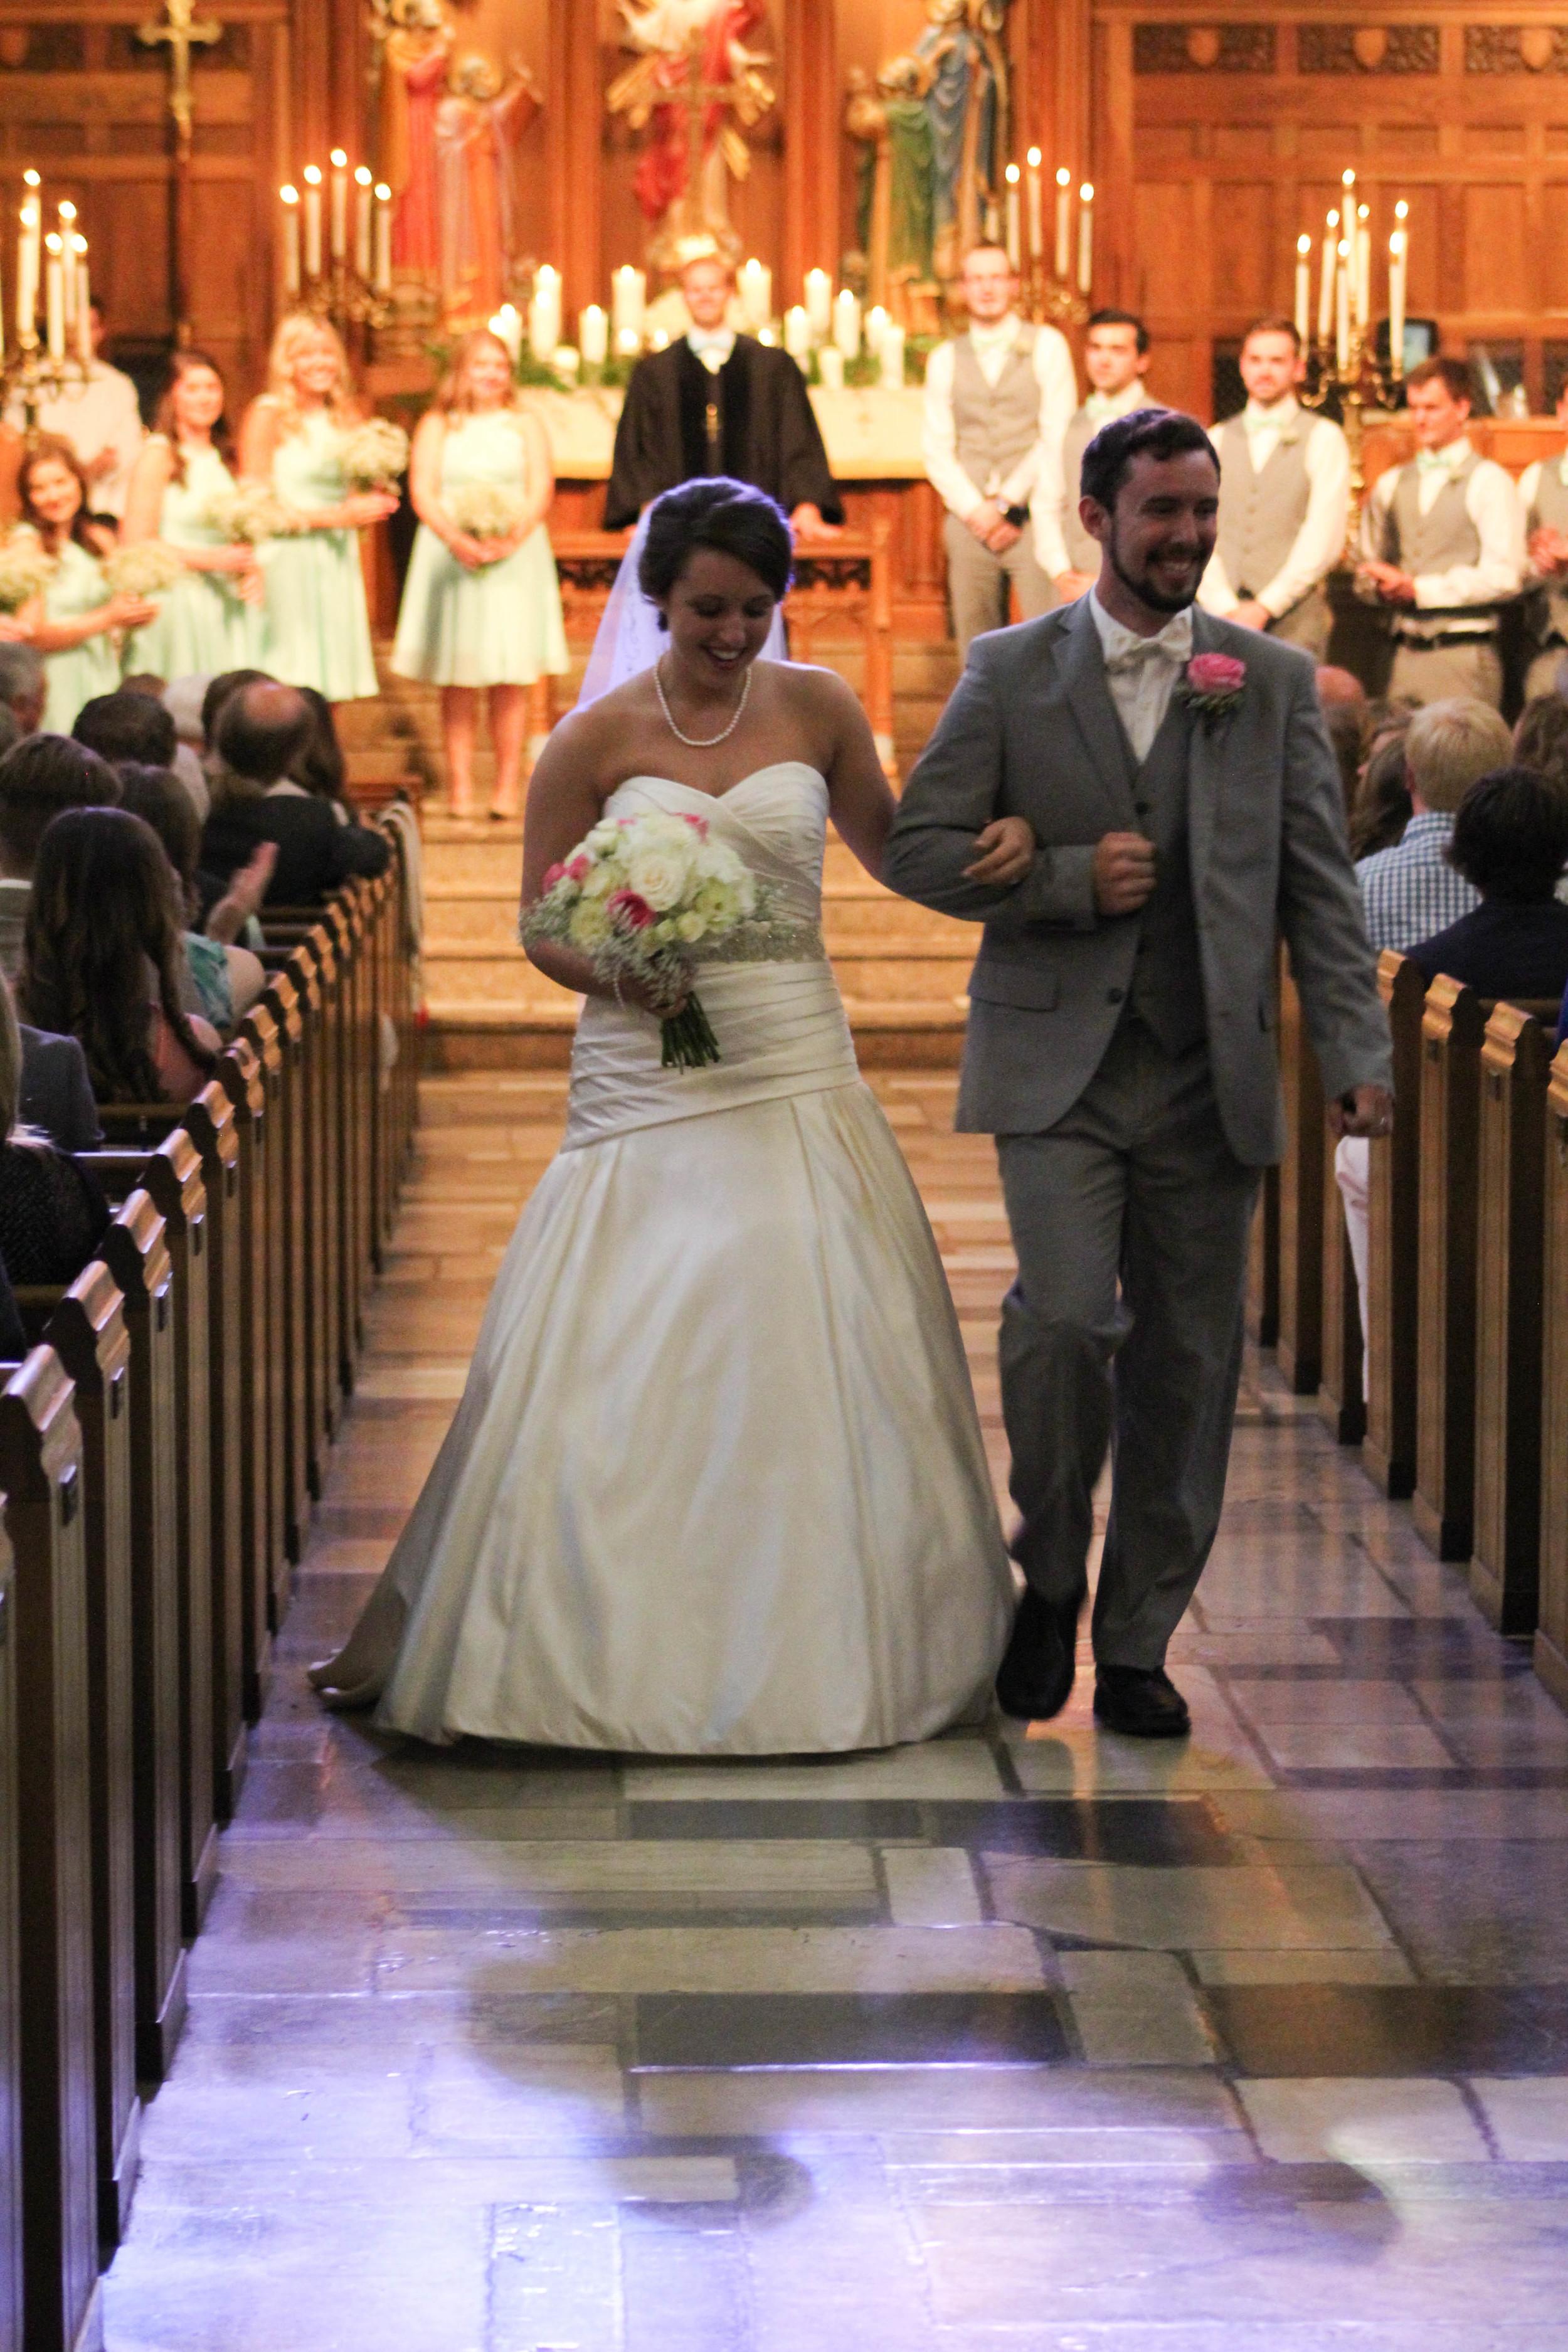 family-ceremony-227.jpg